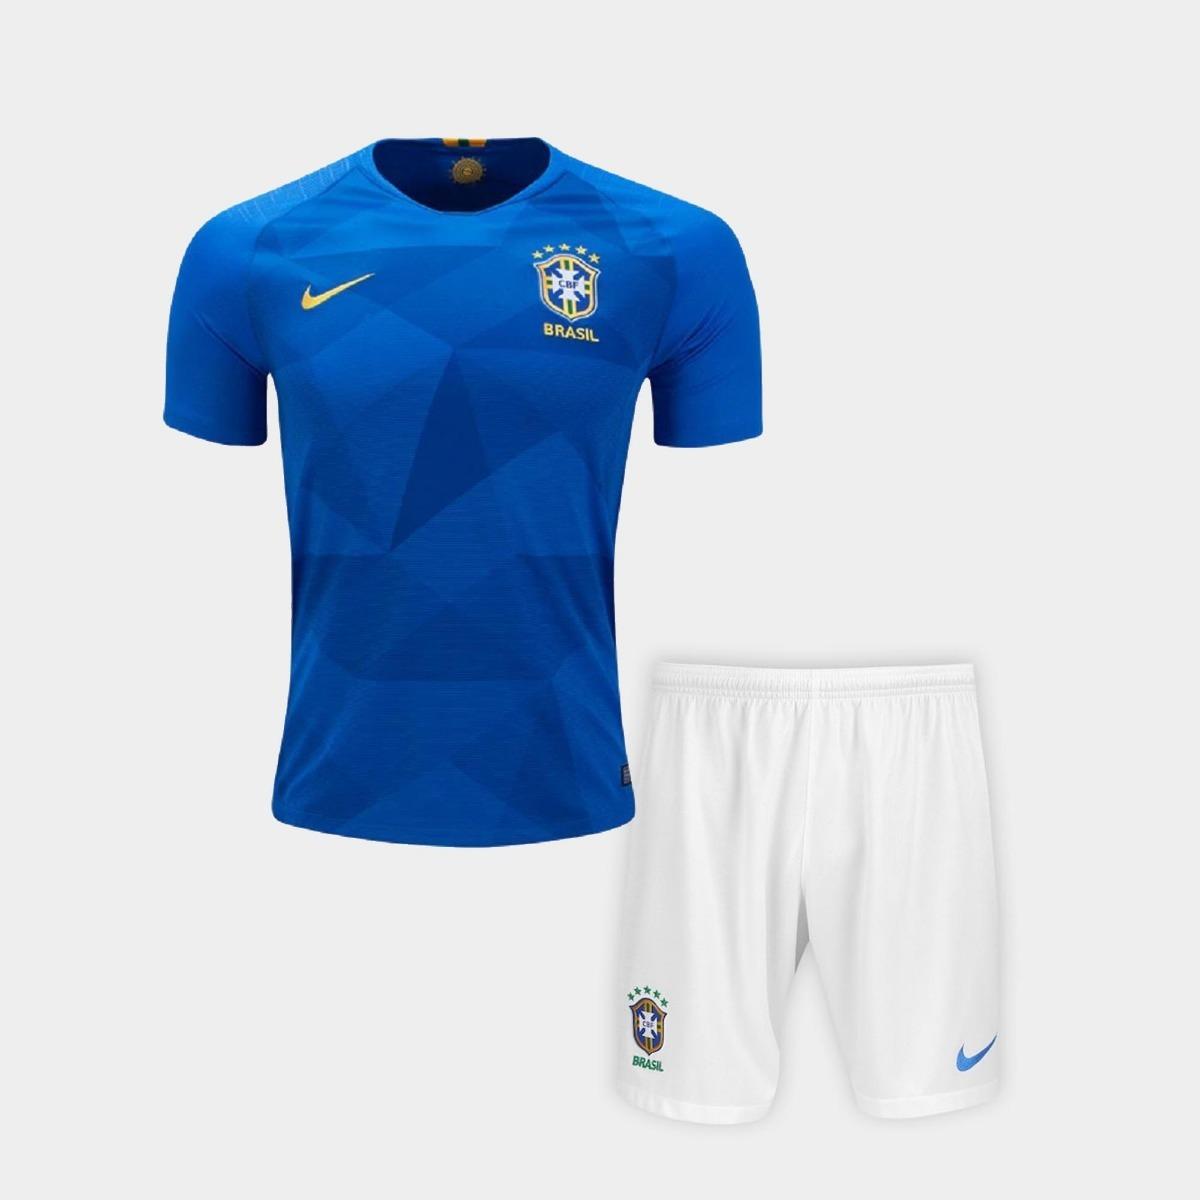 Uniforme Infantil Camisa Shorts Neymar Seleção Brasil 2018 - R  139 ... 6eae2f7a44aab